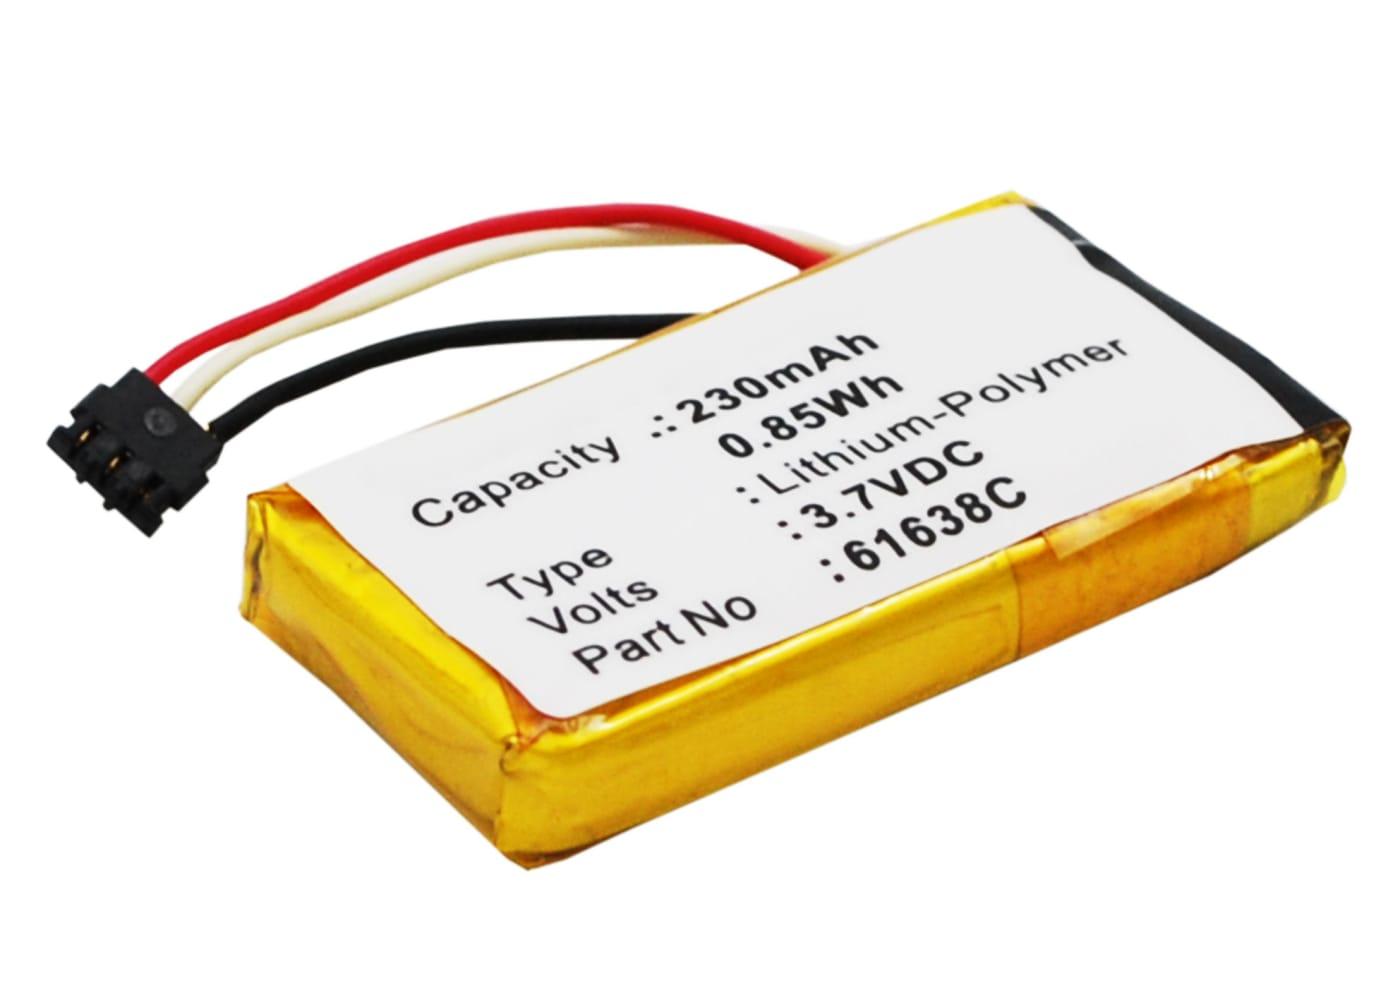 Batterie pour téléphone fixe Motorola IT6-1, Motorola IT6-2, Motorola DECT 6.0 - 61638C,SNN5904A 230mAh